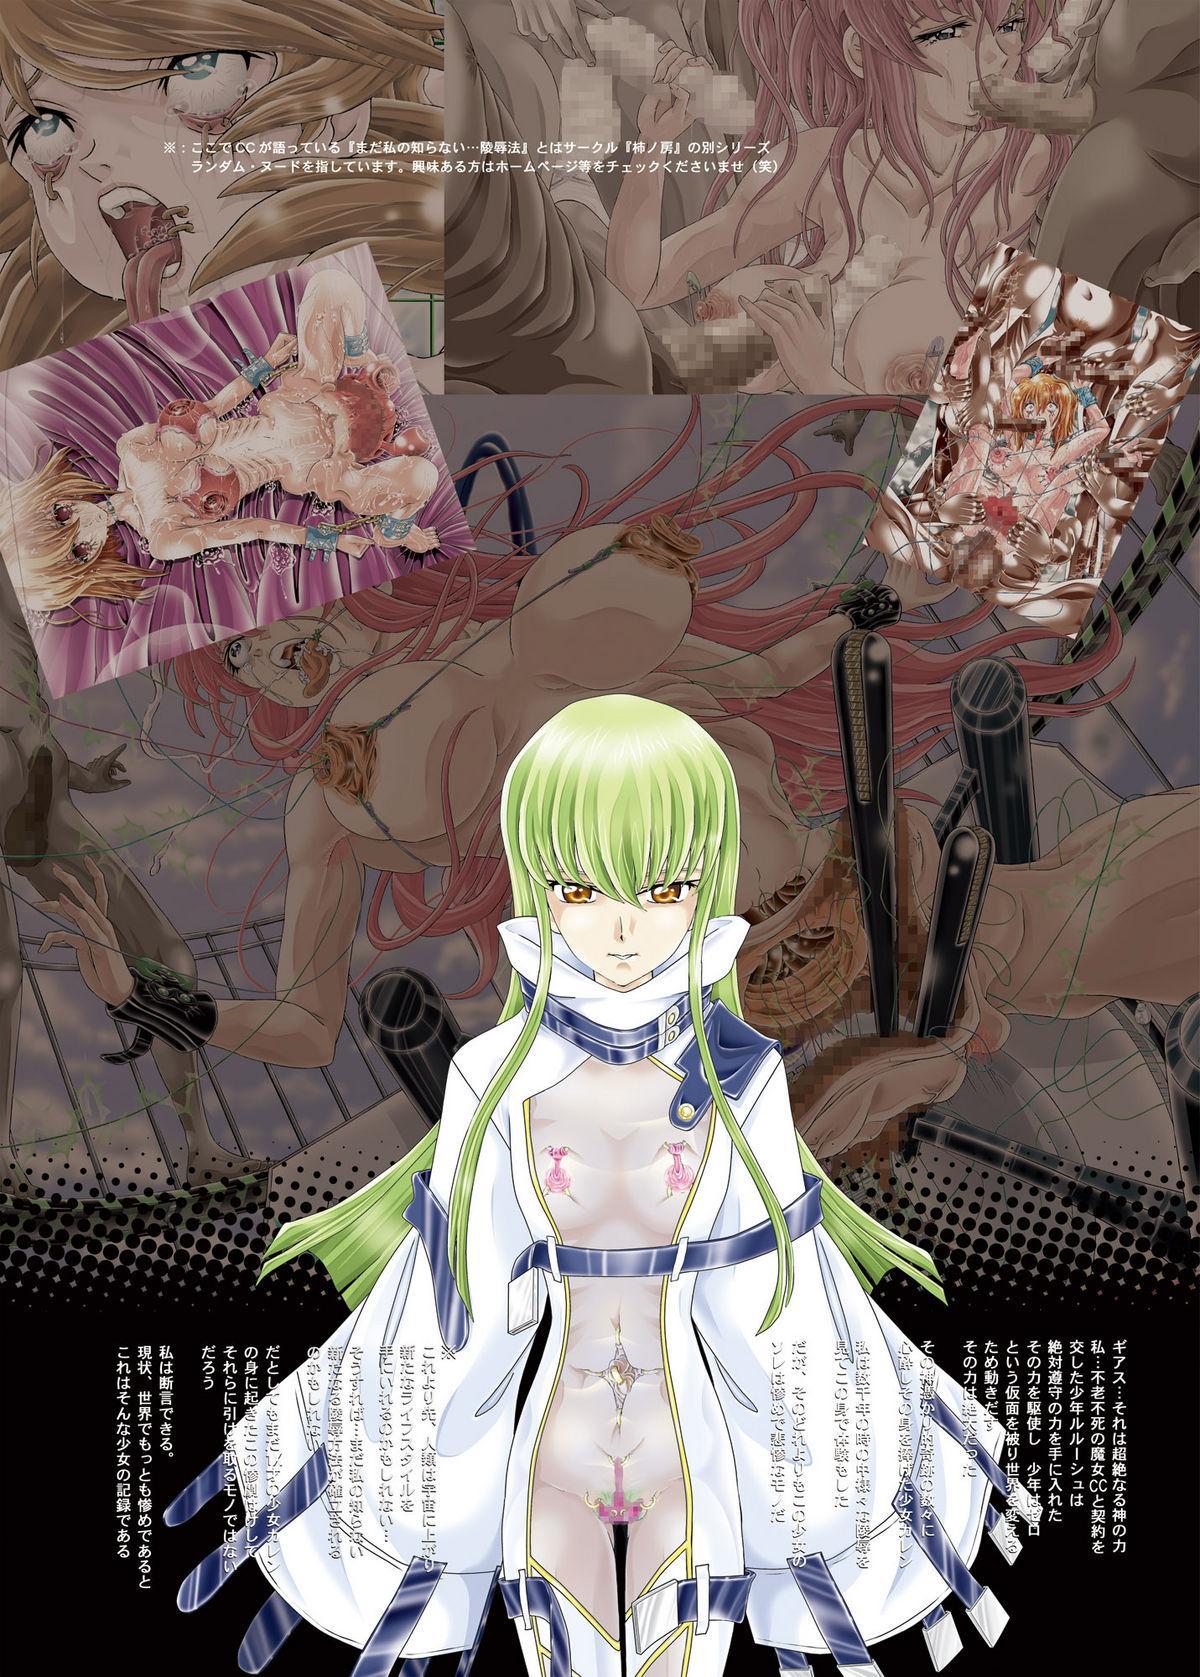 [Kaki no Boo (Kakinomoto Utamaro)] Karen - R22 of the Cord Eros - Infringement (Code Geass) [Digital] 1